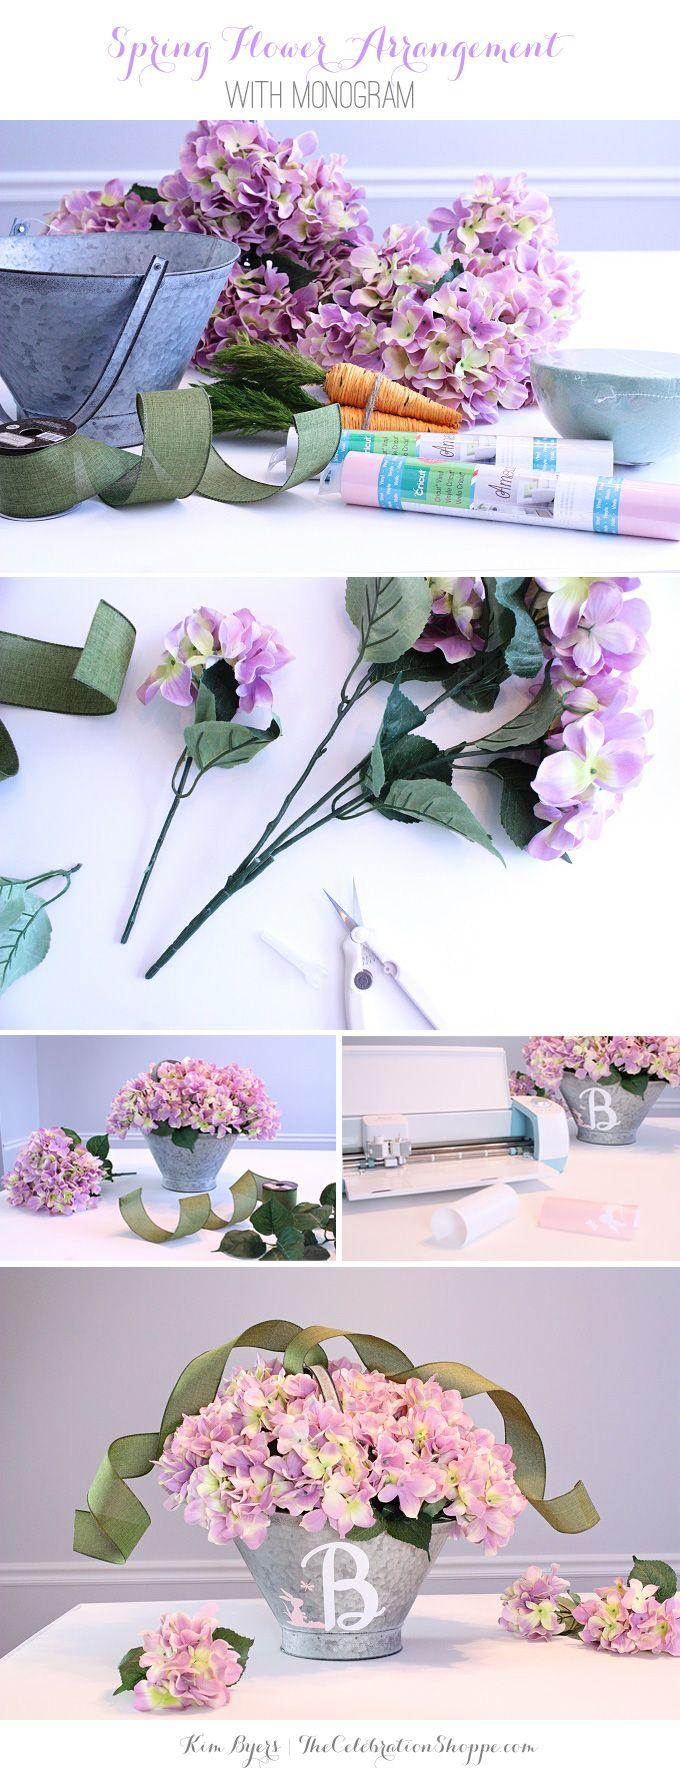 Monogram A Galvanized Bucket for the perfect Spring Flower Arrangement! | @kimbyers TheCelebrationShoppe.com